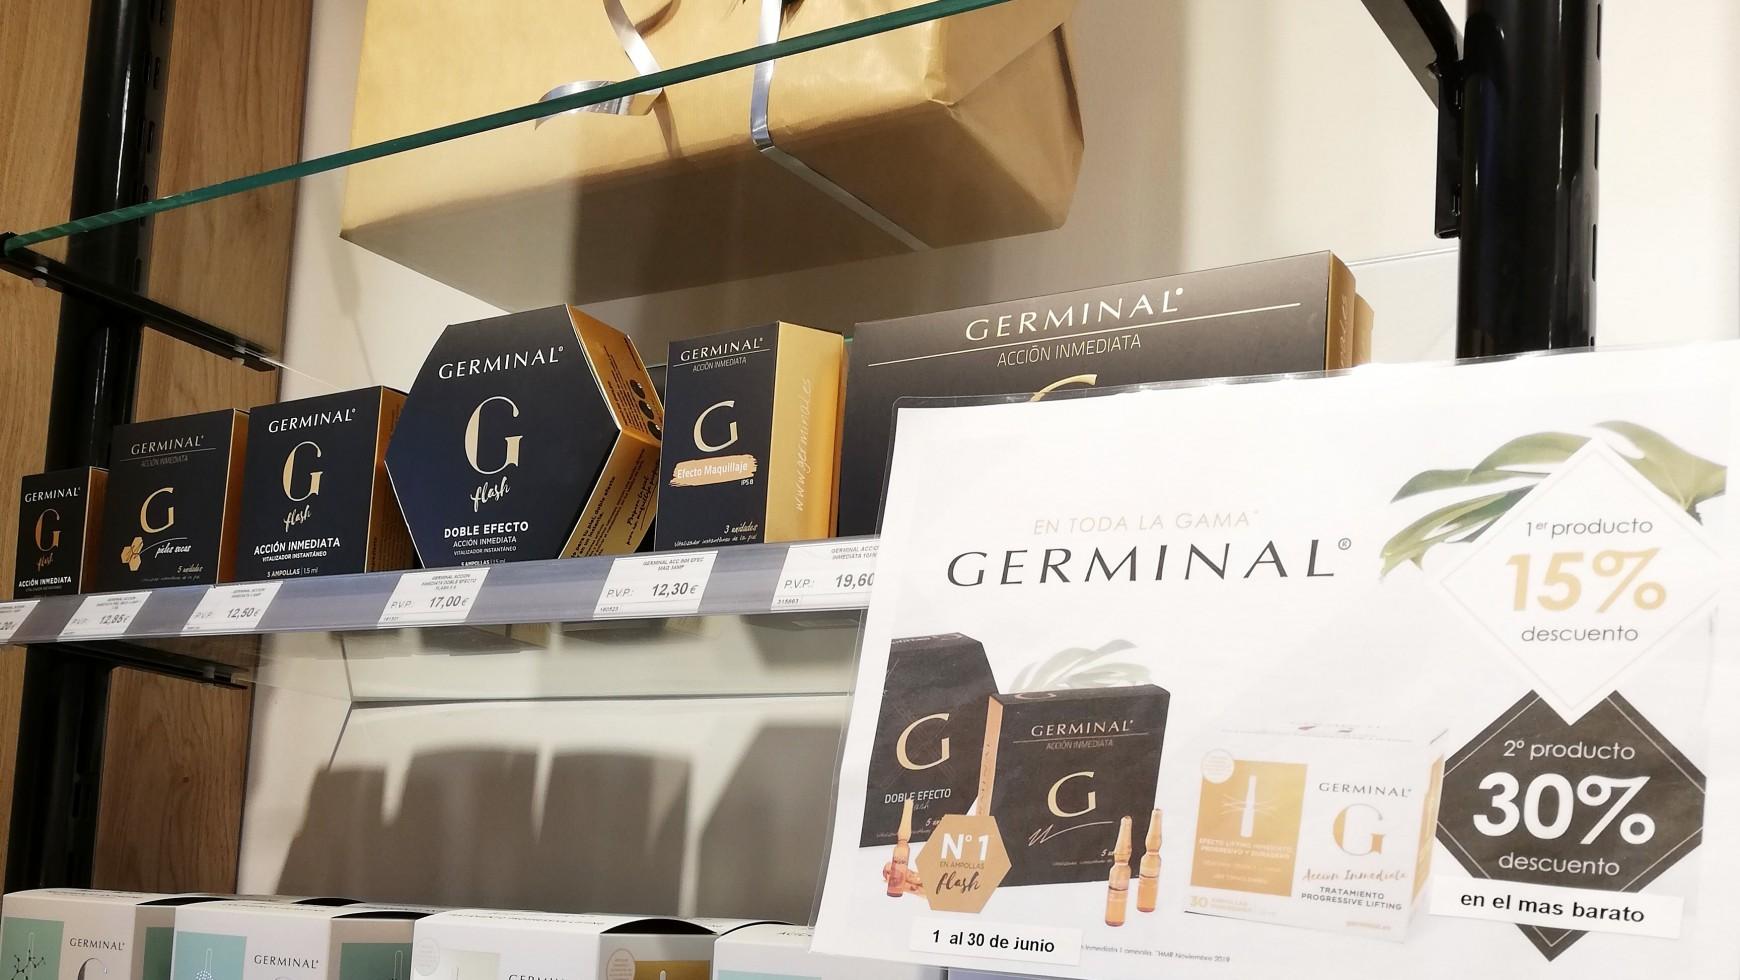 Promo Germinal!!!